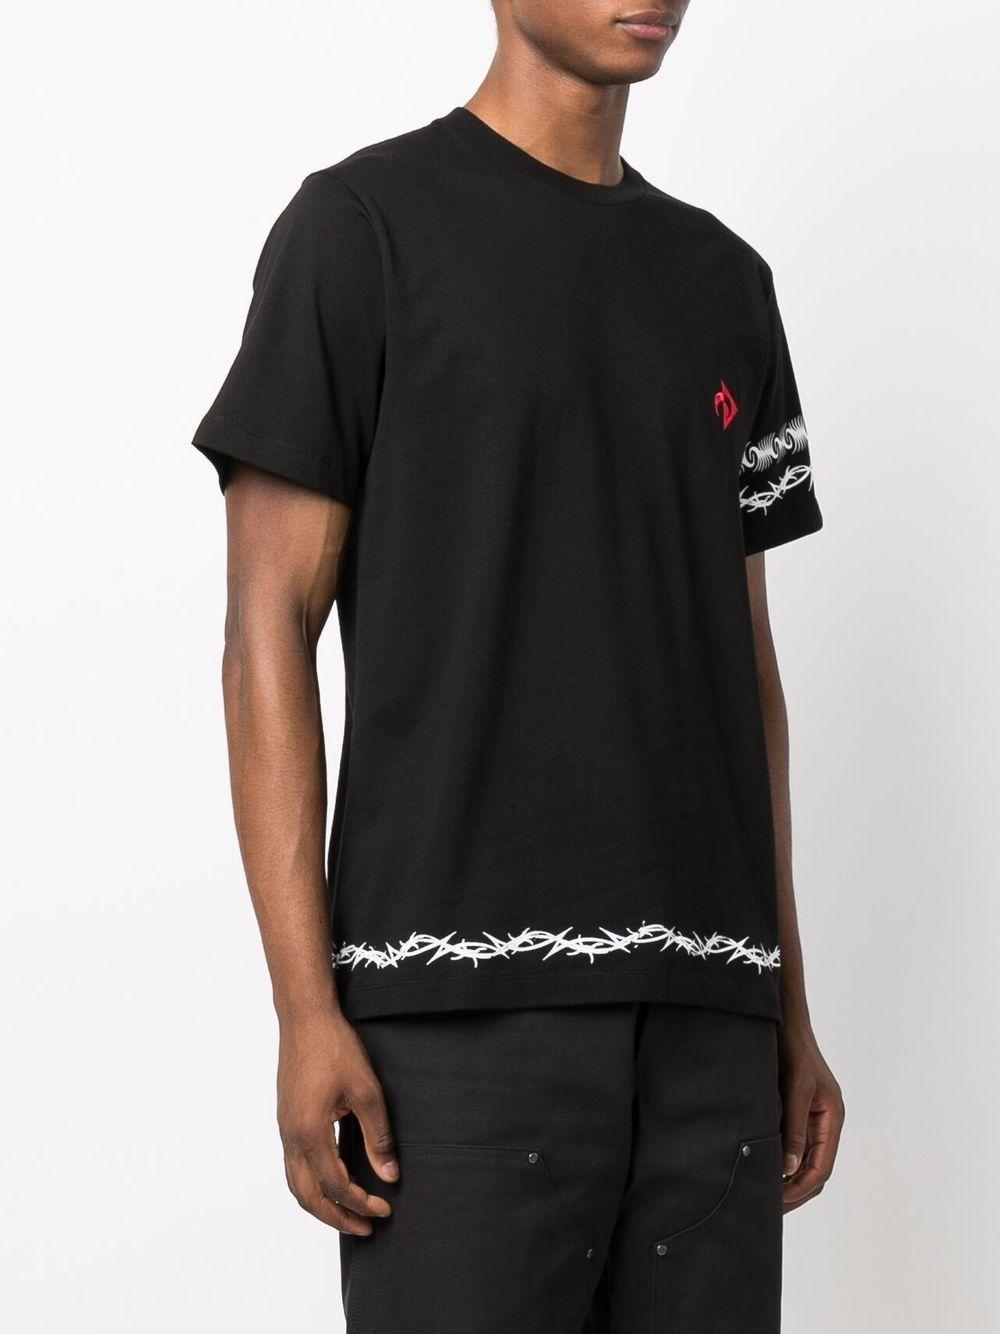 t-shirt con logo uomo nera in cotone MARINE SERRE   T-shirt   T129FW21M00